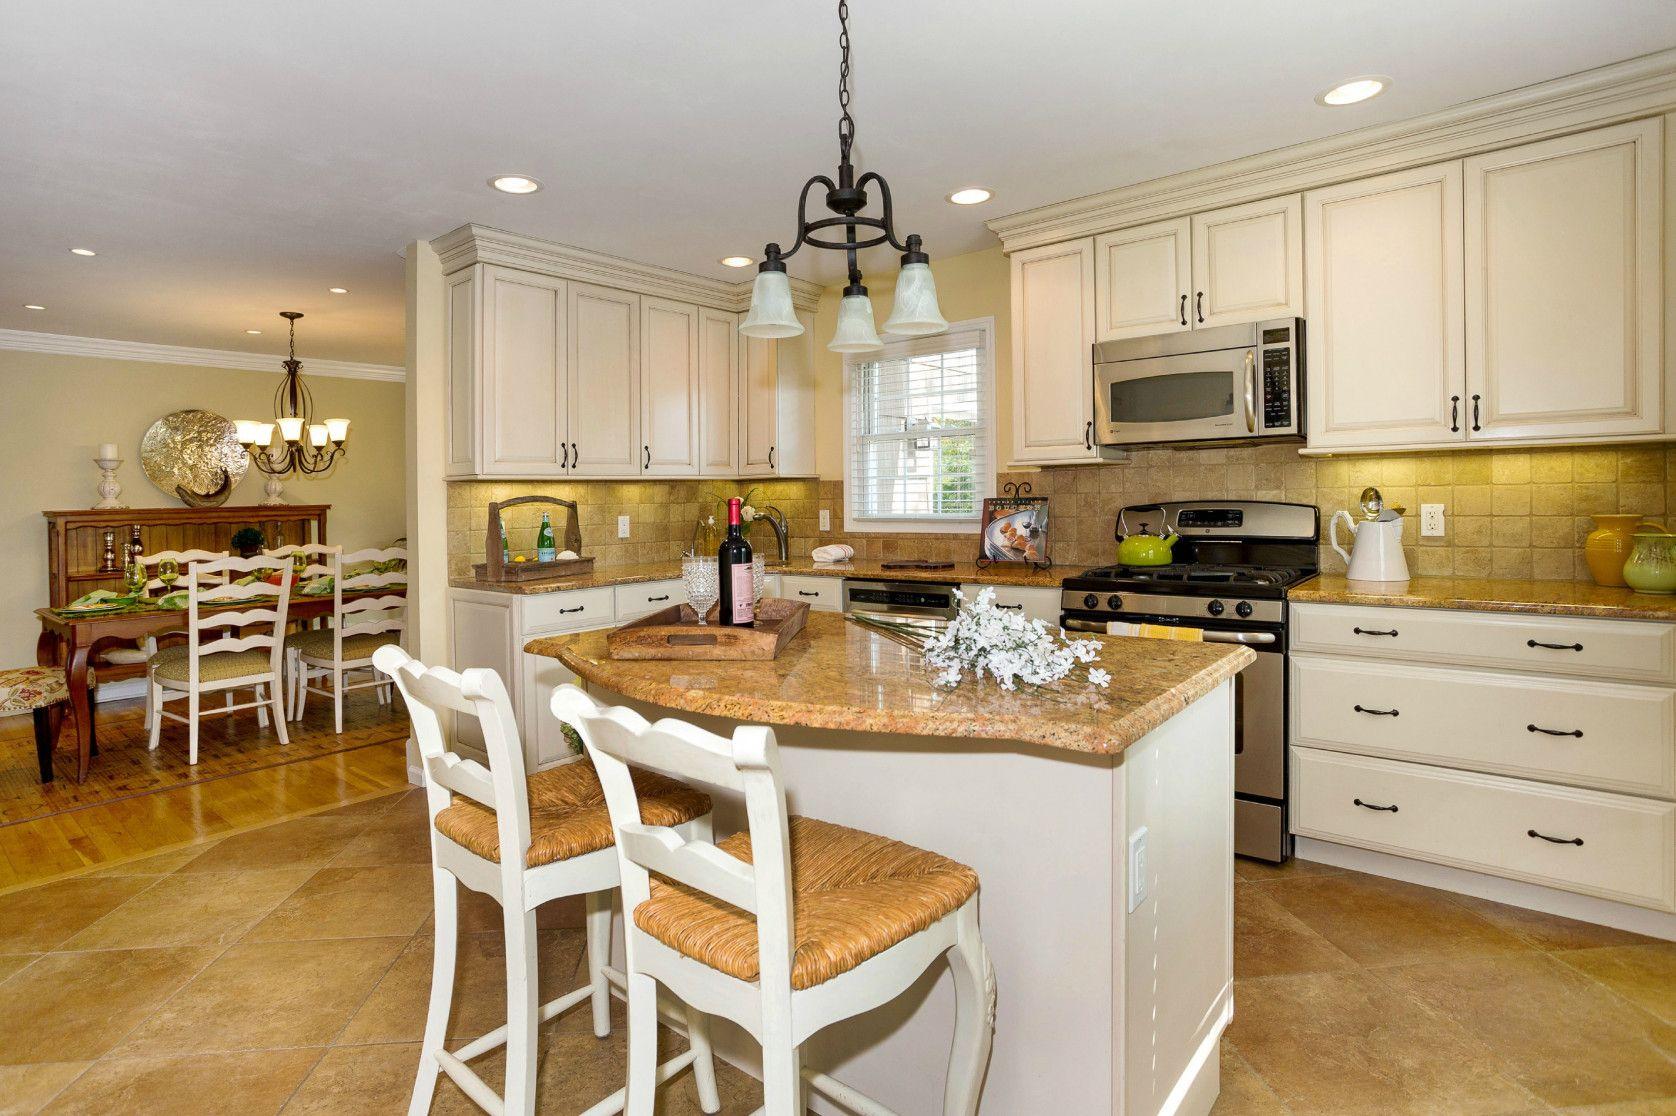 99+ Sell Used Kitchen Cabinets - Unique Kitchen Backsplash ...